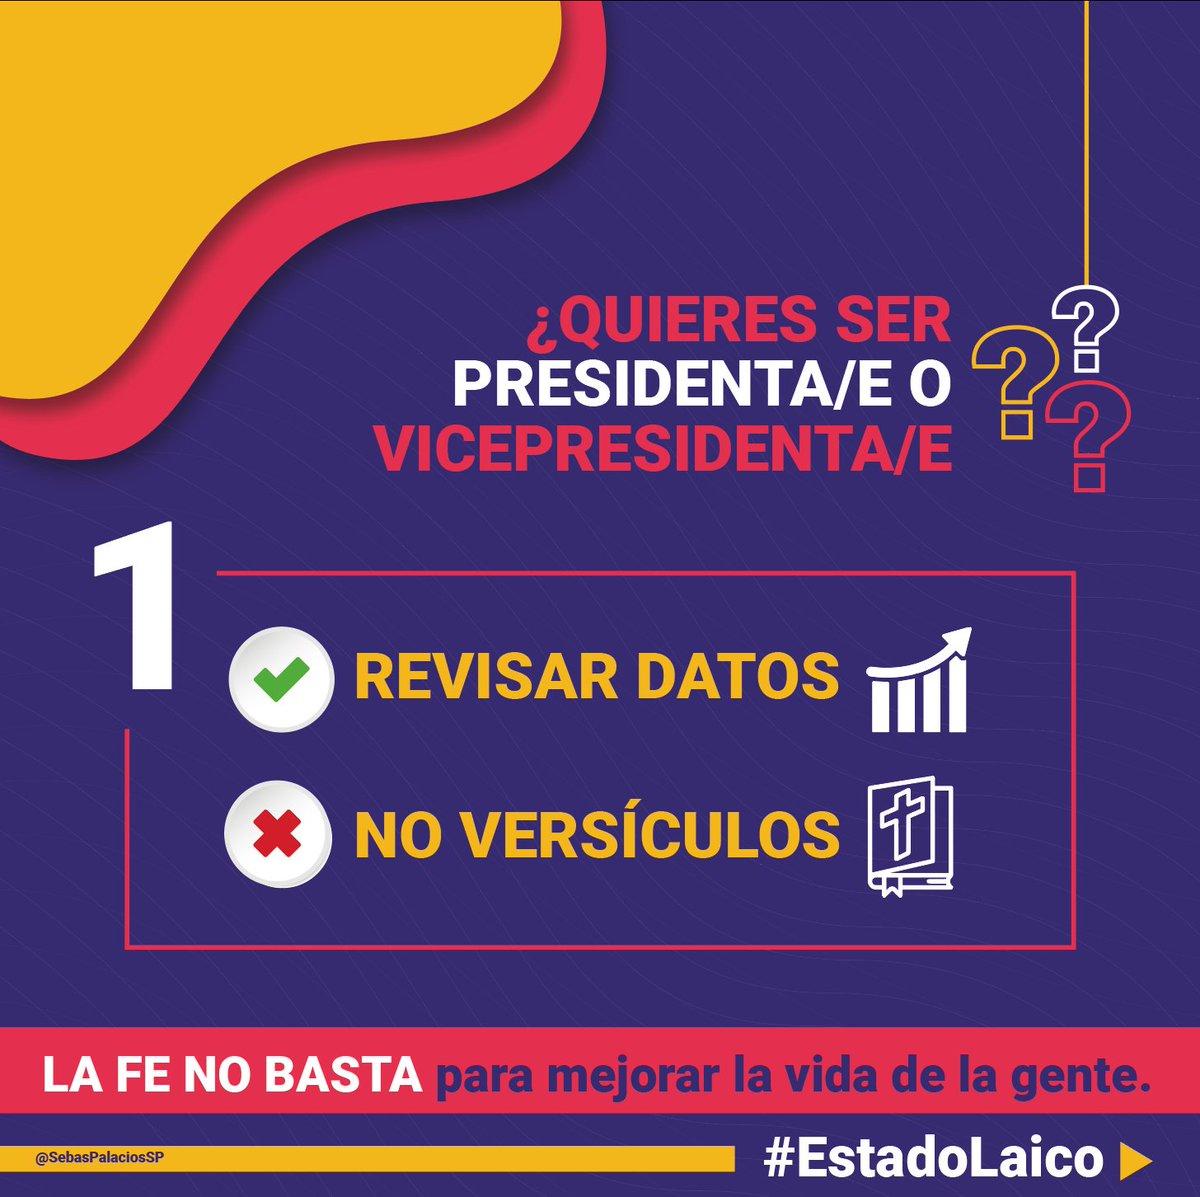 ¿Quieres ser presidenta/e o vicepresidenta/e?  Es muy importante leer esto👇  Tomado del muro del Asambleísta  @SebasPalaciosSP https://t.co/XsPW8s21kx